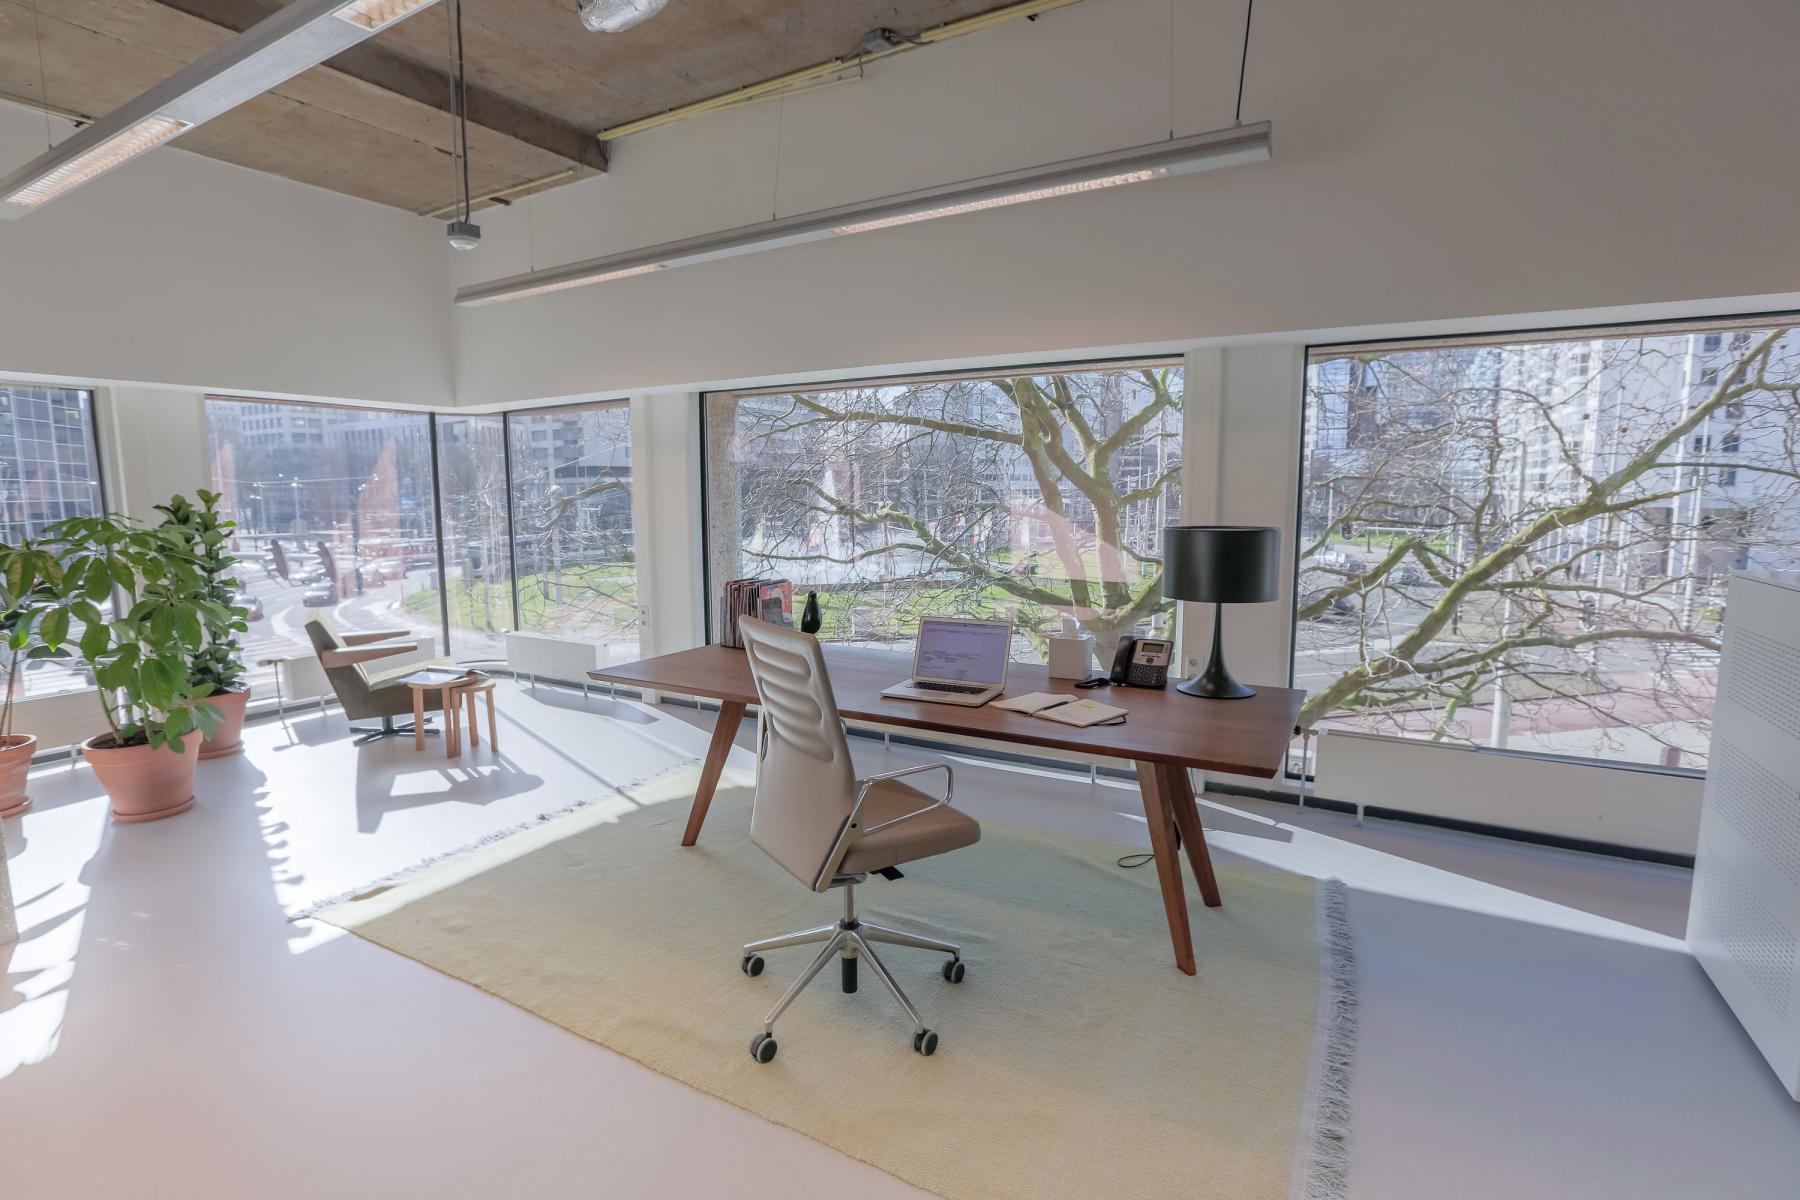 rotterdam hofplein kantoorunit uitzicht kantoorruimte huren